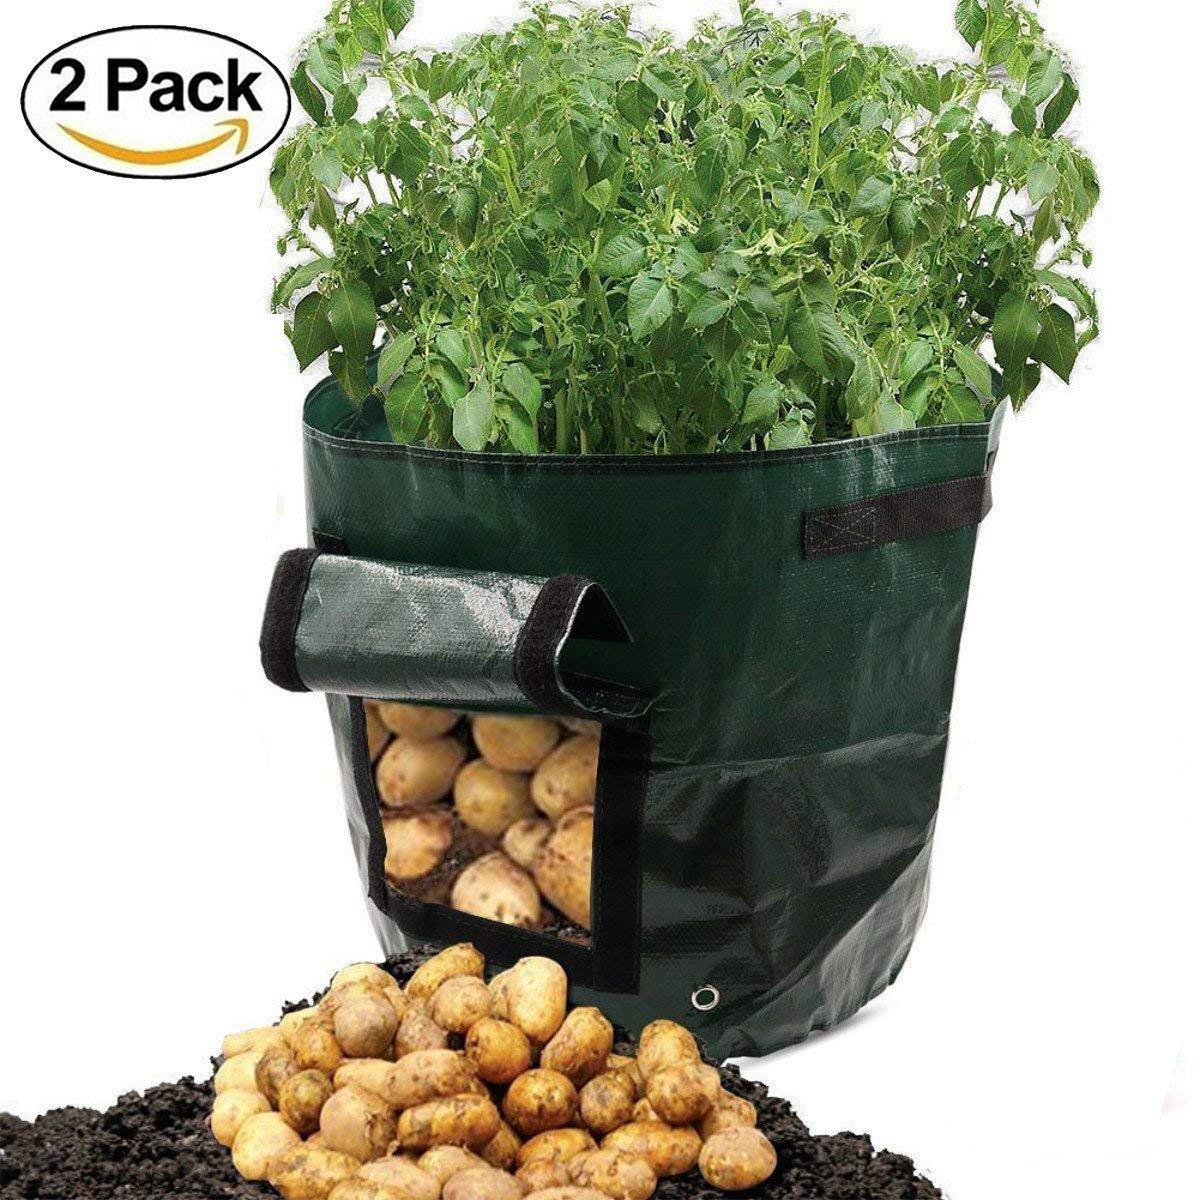 PRINTEMPS 2 PCS Garden Potato Grow Bag,Durable Potato Planter Bags with Access Flap, Raised Garden Bed for Planting Vegetables, Taro, Radish, Carrots, Onions (10 Gallon)